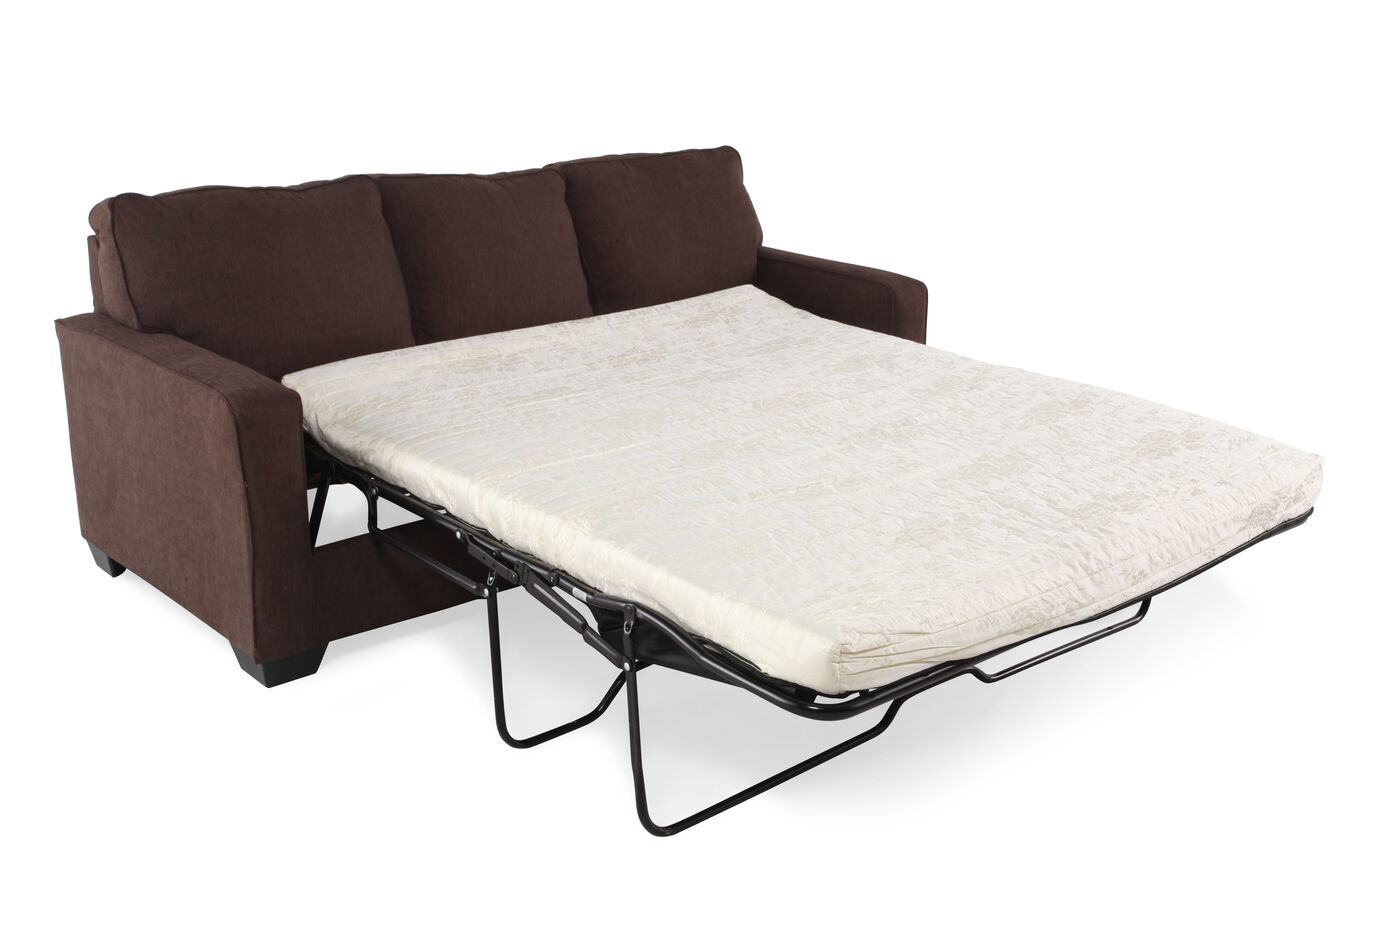 Contemporary 82 Queen Sleeper Sofa in Espresso